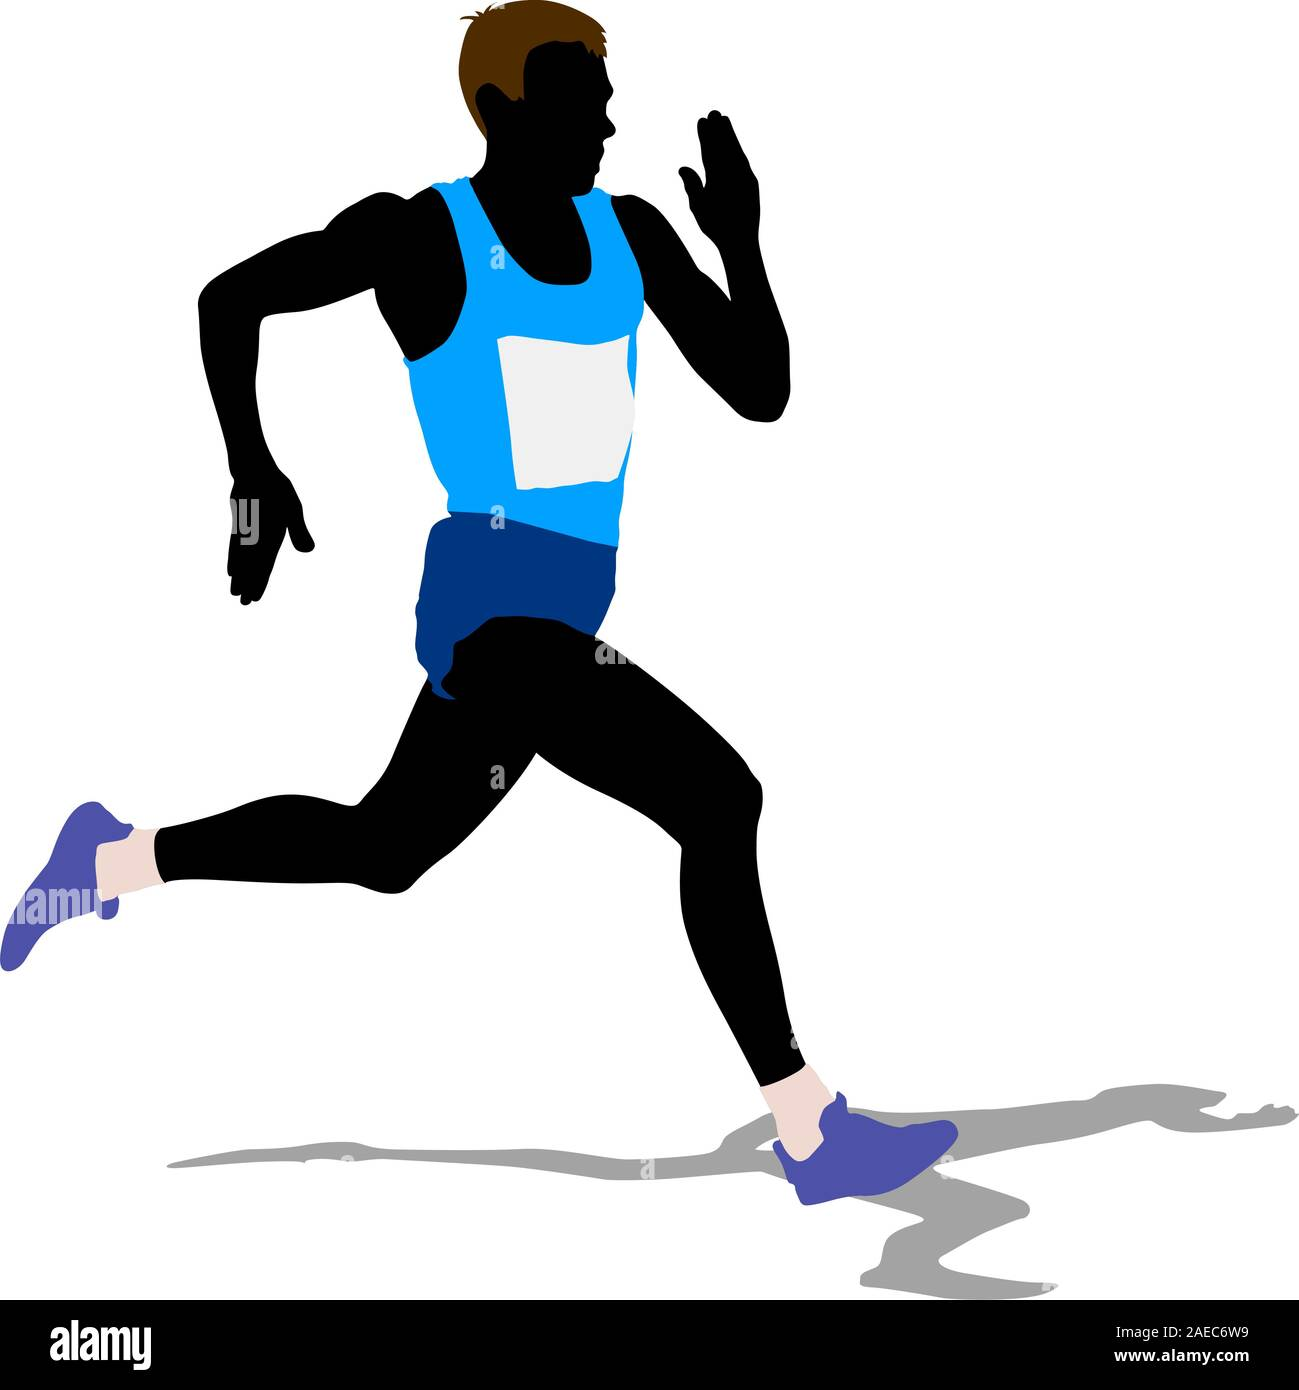 athlete on running race, silhouettes. vector illustration stock vector  image & art - alamy  alamy